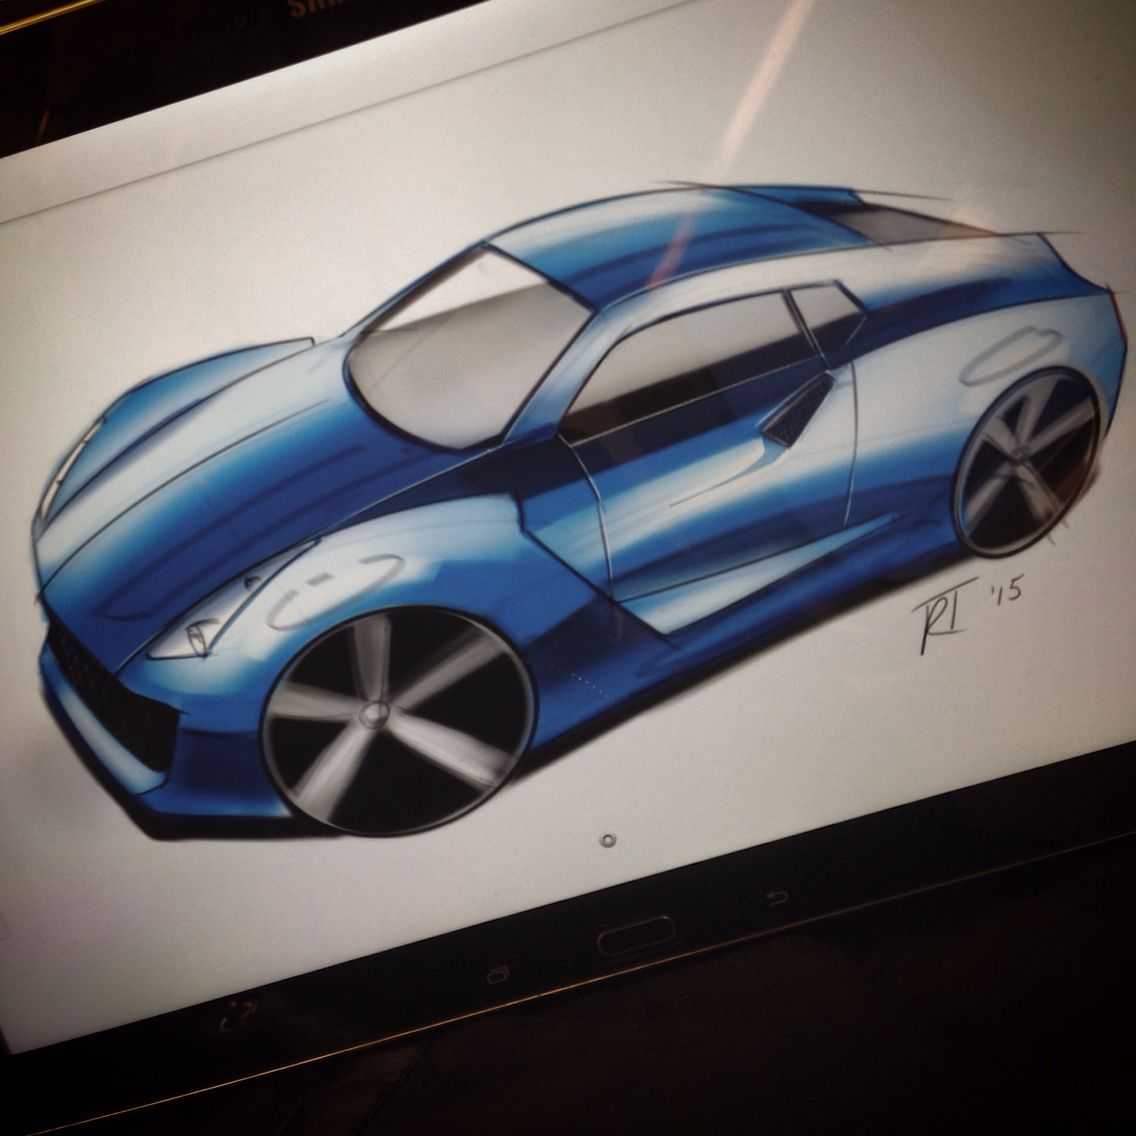 #sketch #sketchaday #sketchbook #drawing #concept #car #cardesign #rendering #industrialdesign #cardesignerscommunity by Remco Timmer on instagram